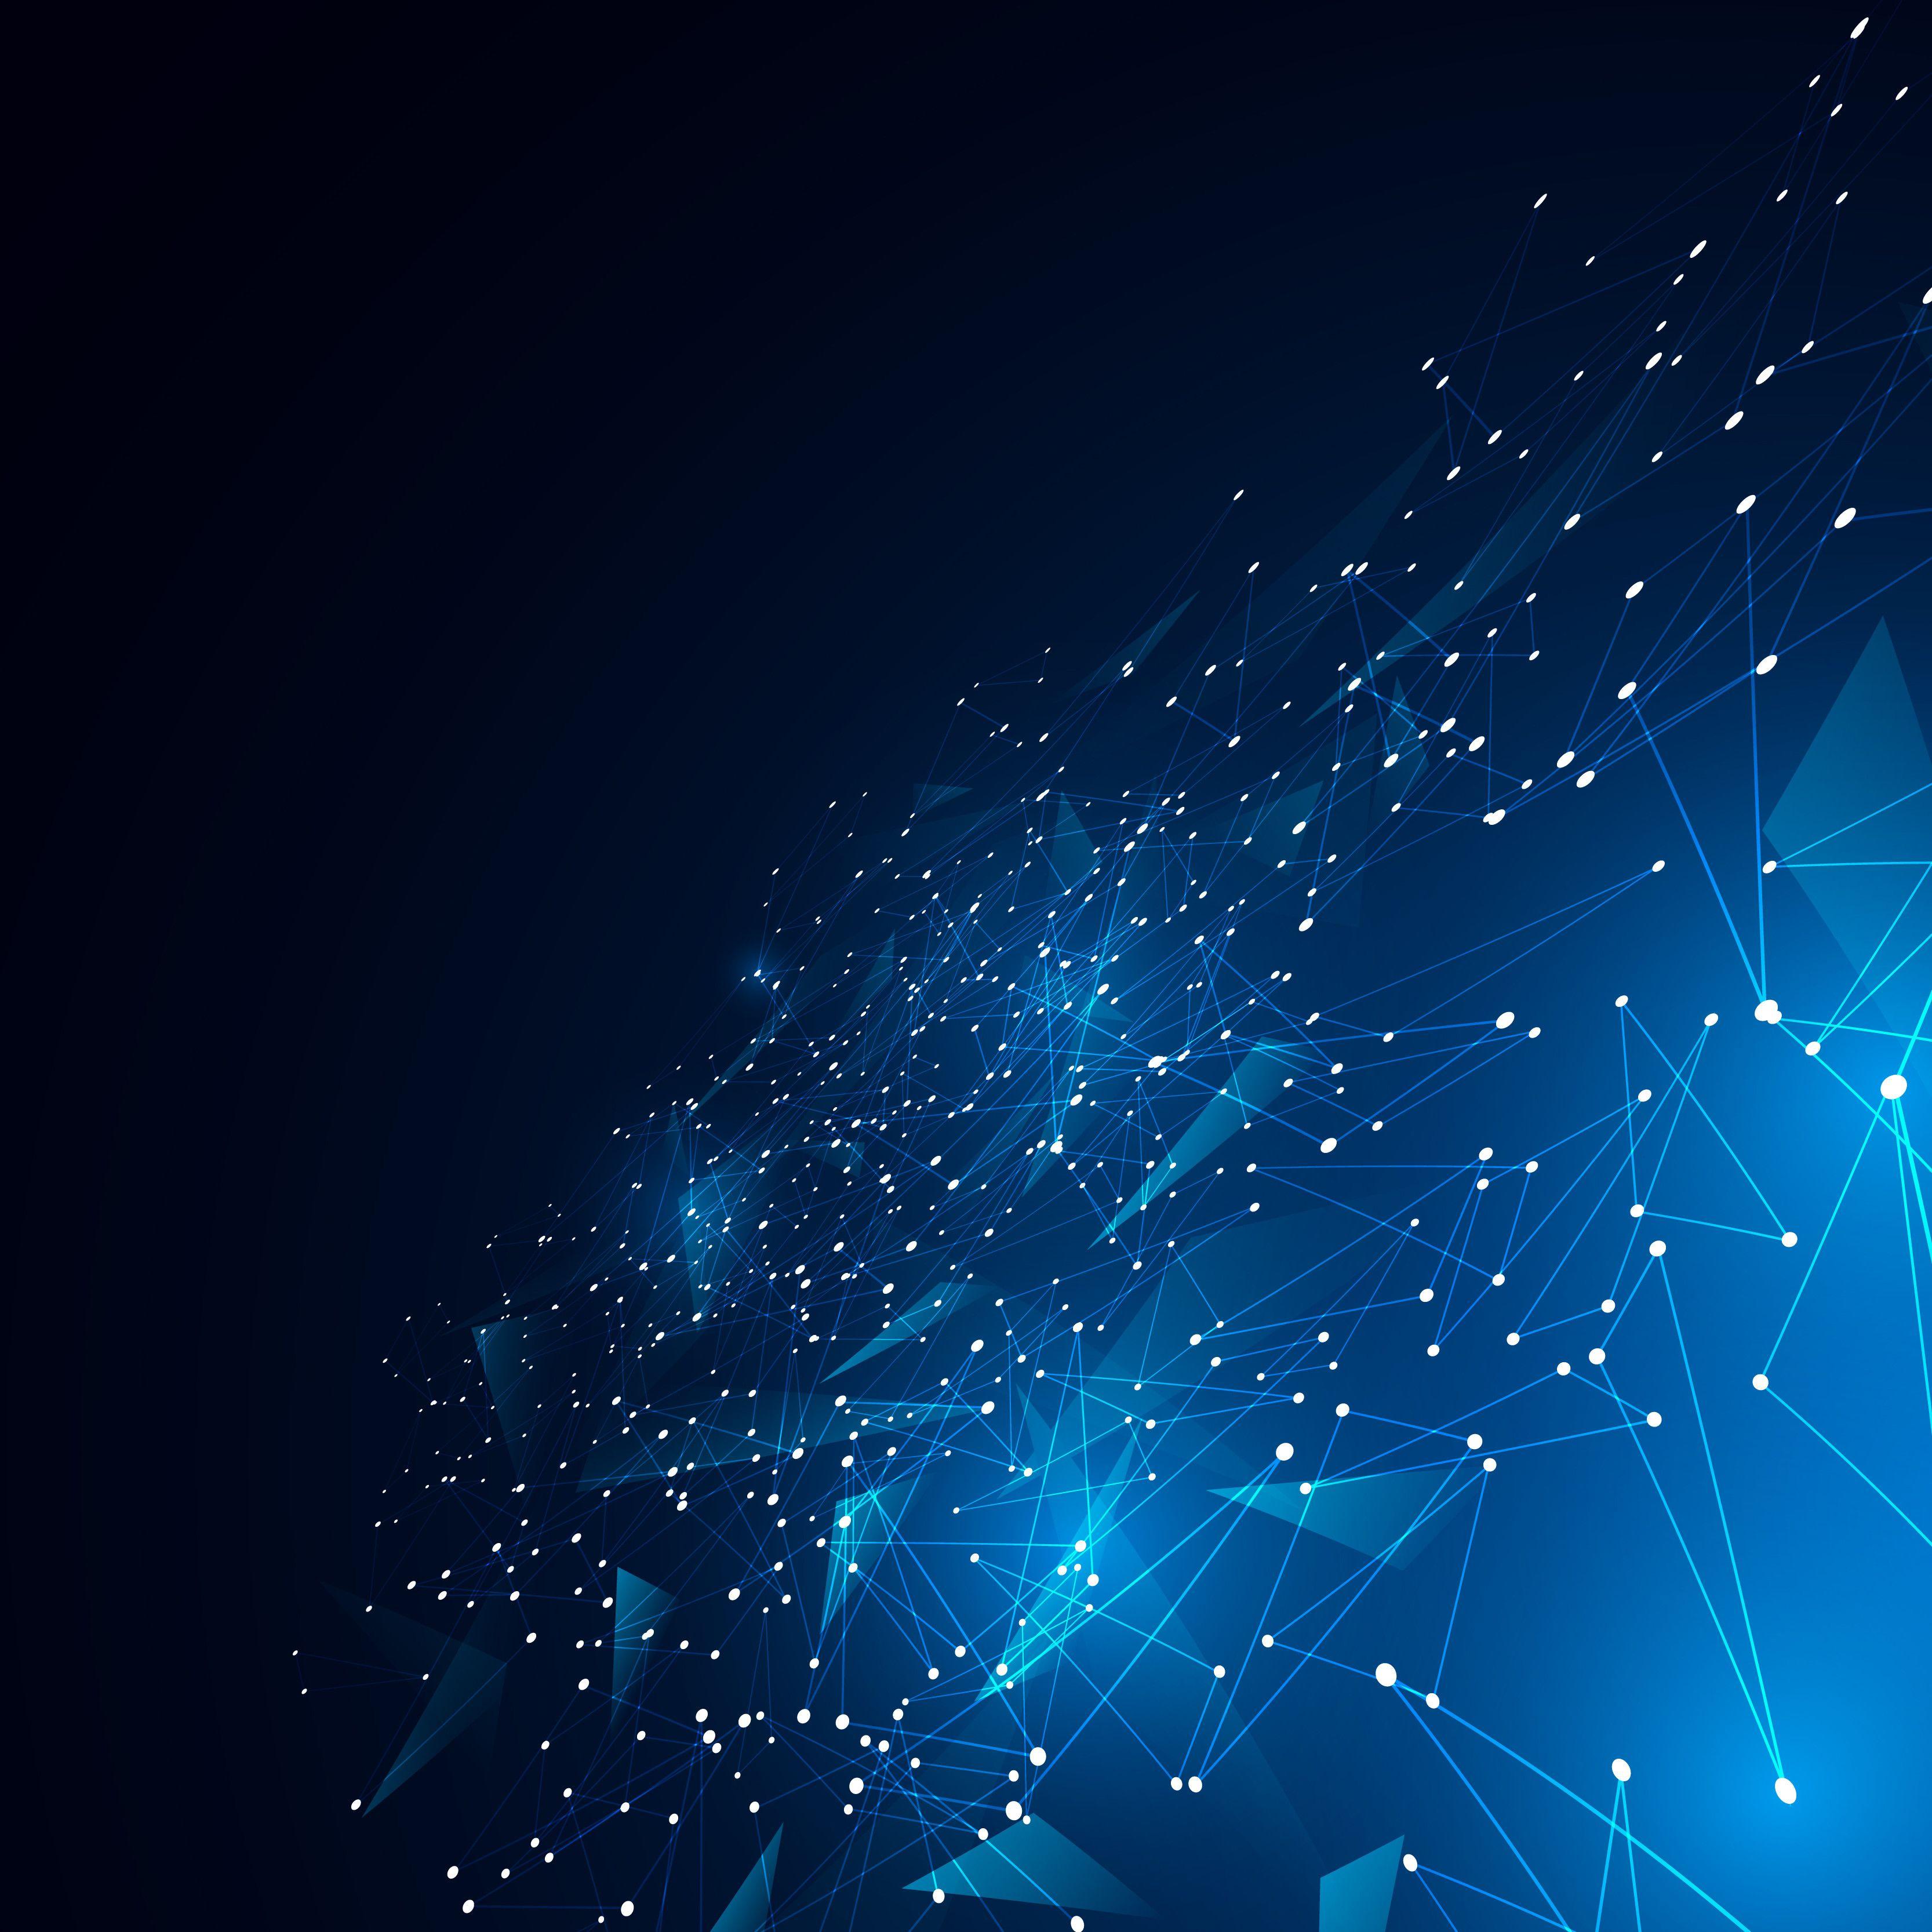 Blockchain Vision Blue net Backgrounds downloading 3333x3333